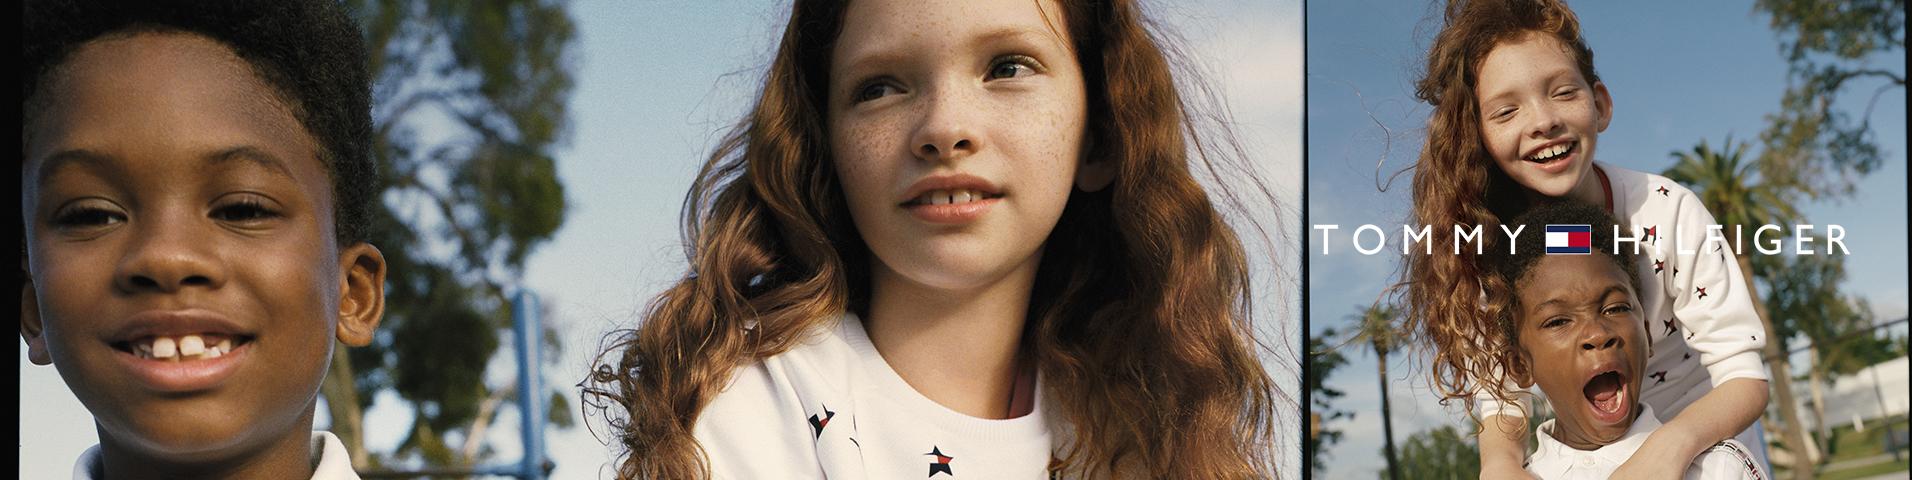 945106c8b Tommy Hilfiger Kids' Clothing Sale   Girls & Boys   ZALANDO UK